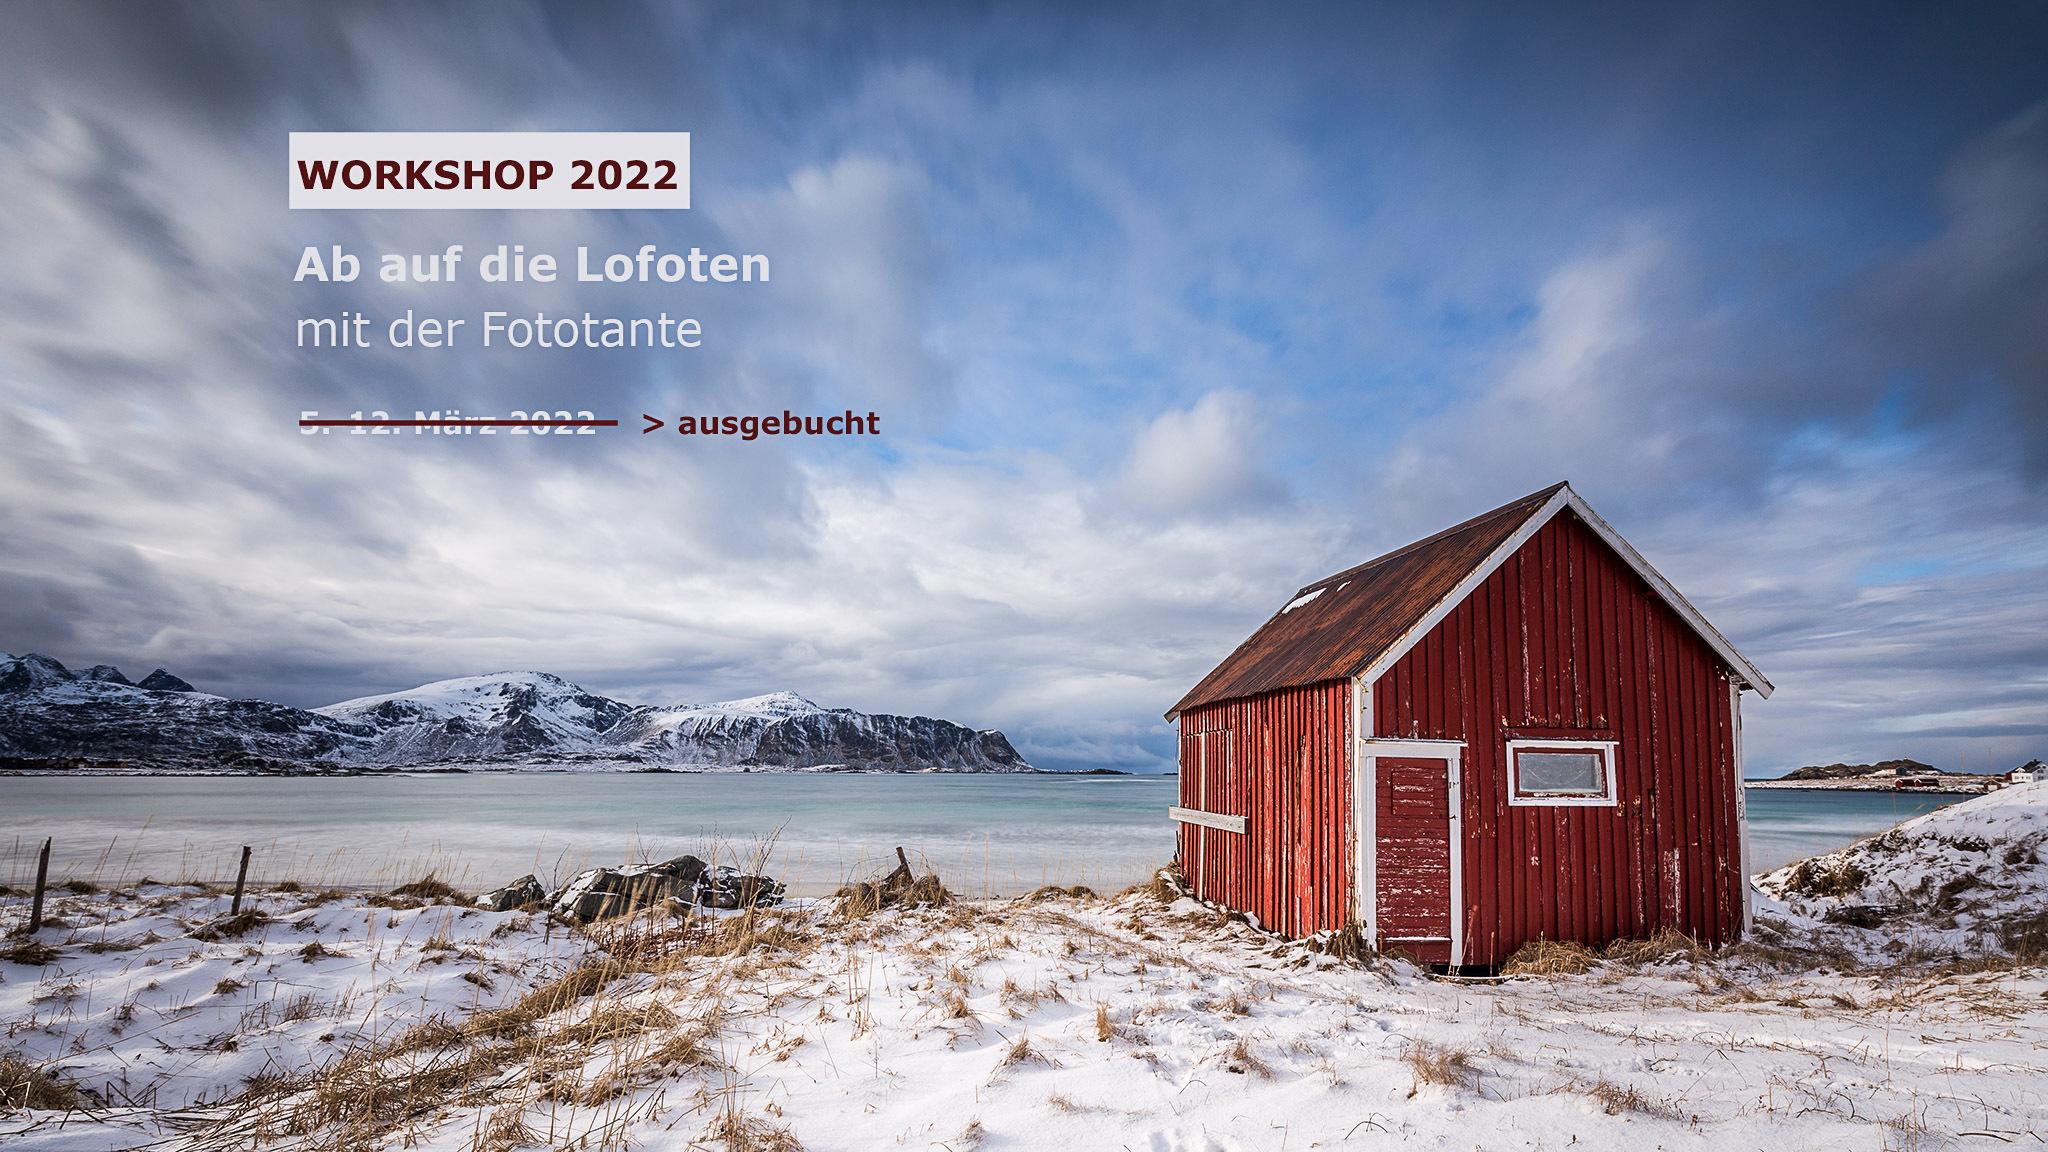 Workshop-Fotoreise-Fototante-Lofoten.jpg#asset:2475